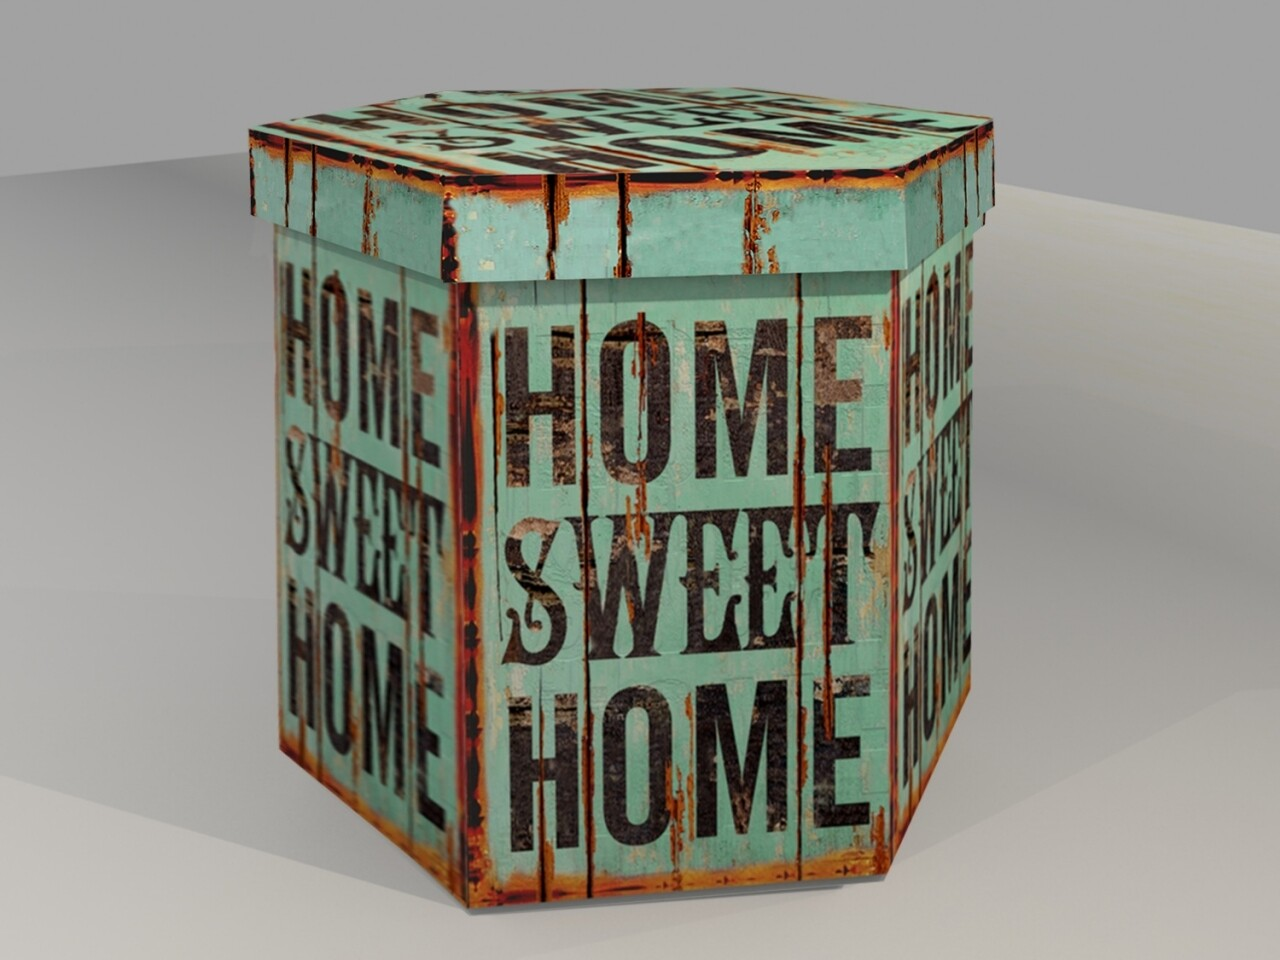 Taburet pliabil cu spatiu de depozitare Sweet Home, Heinner Home, 38 x 38 x 43 cm, PVC, albastru